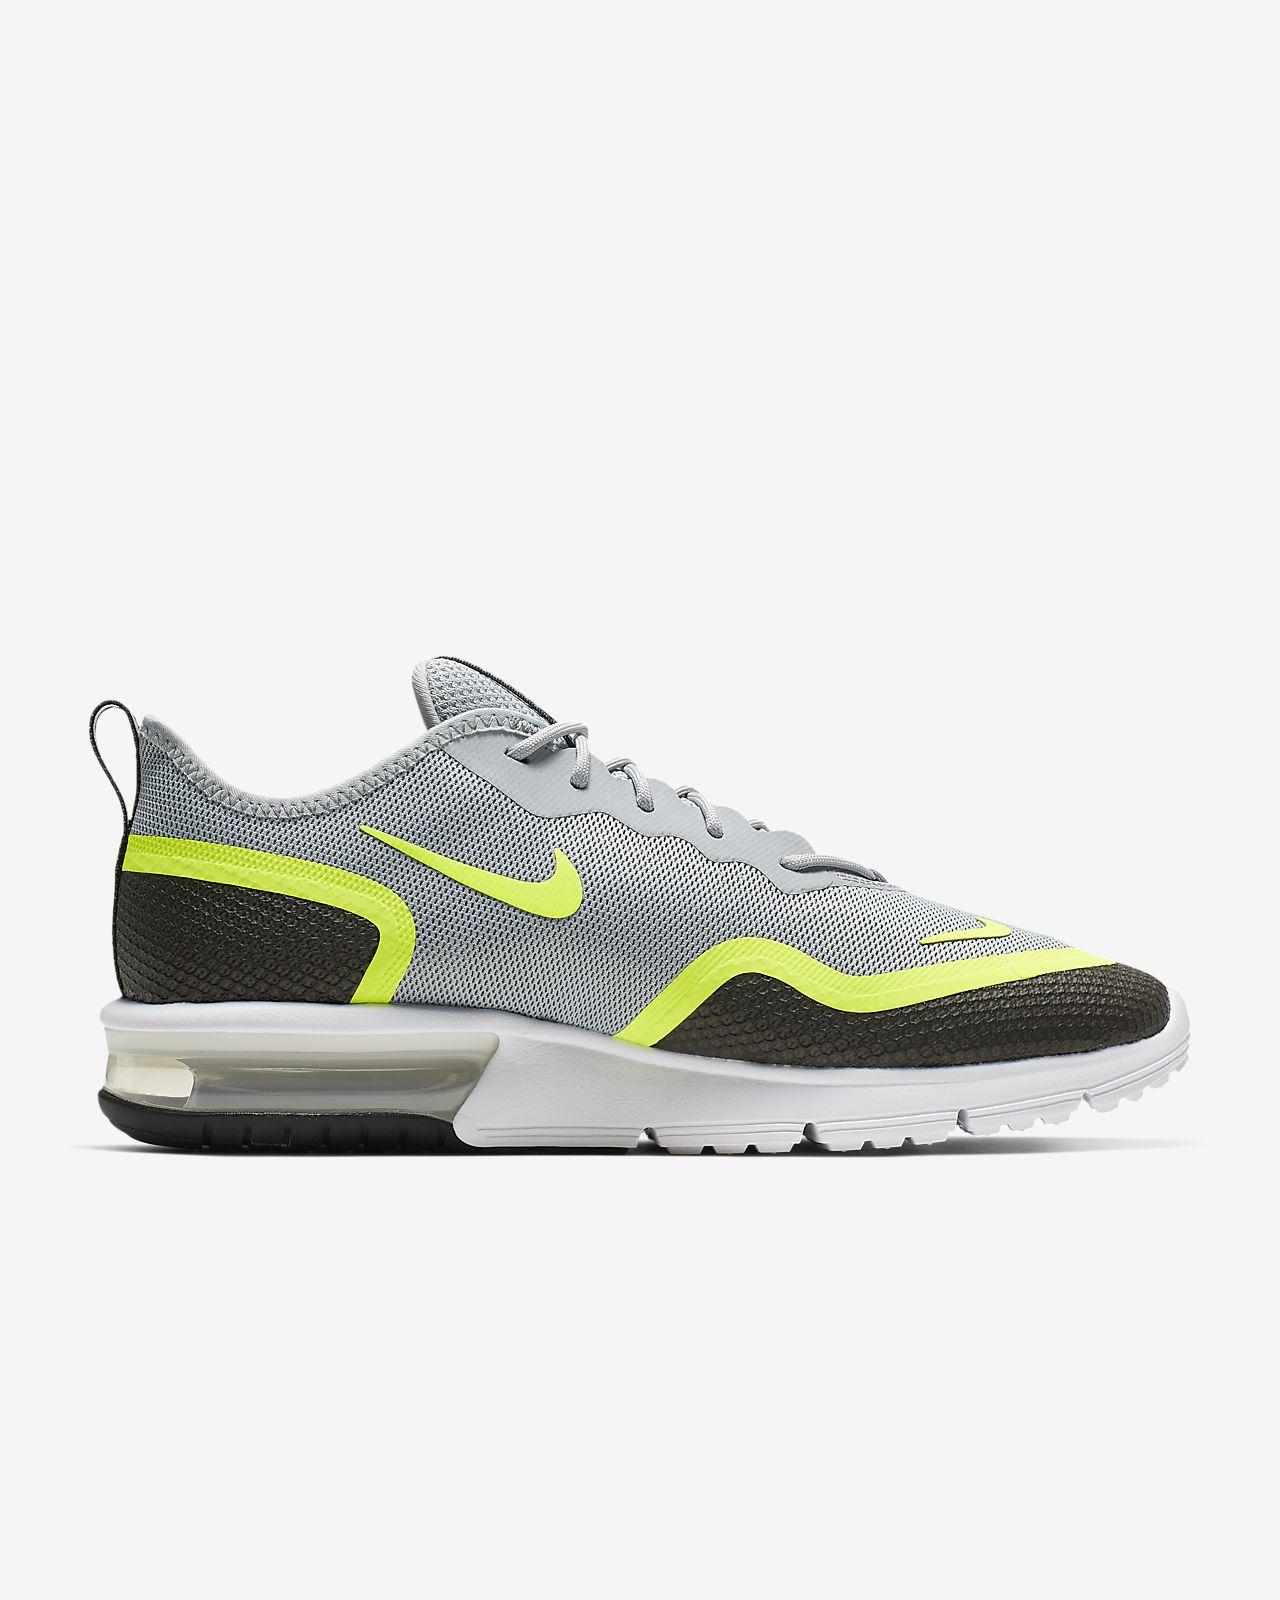 low priced 0b355 849c4 ... Sko Nike Air Max Sequent 4.5 SE för män